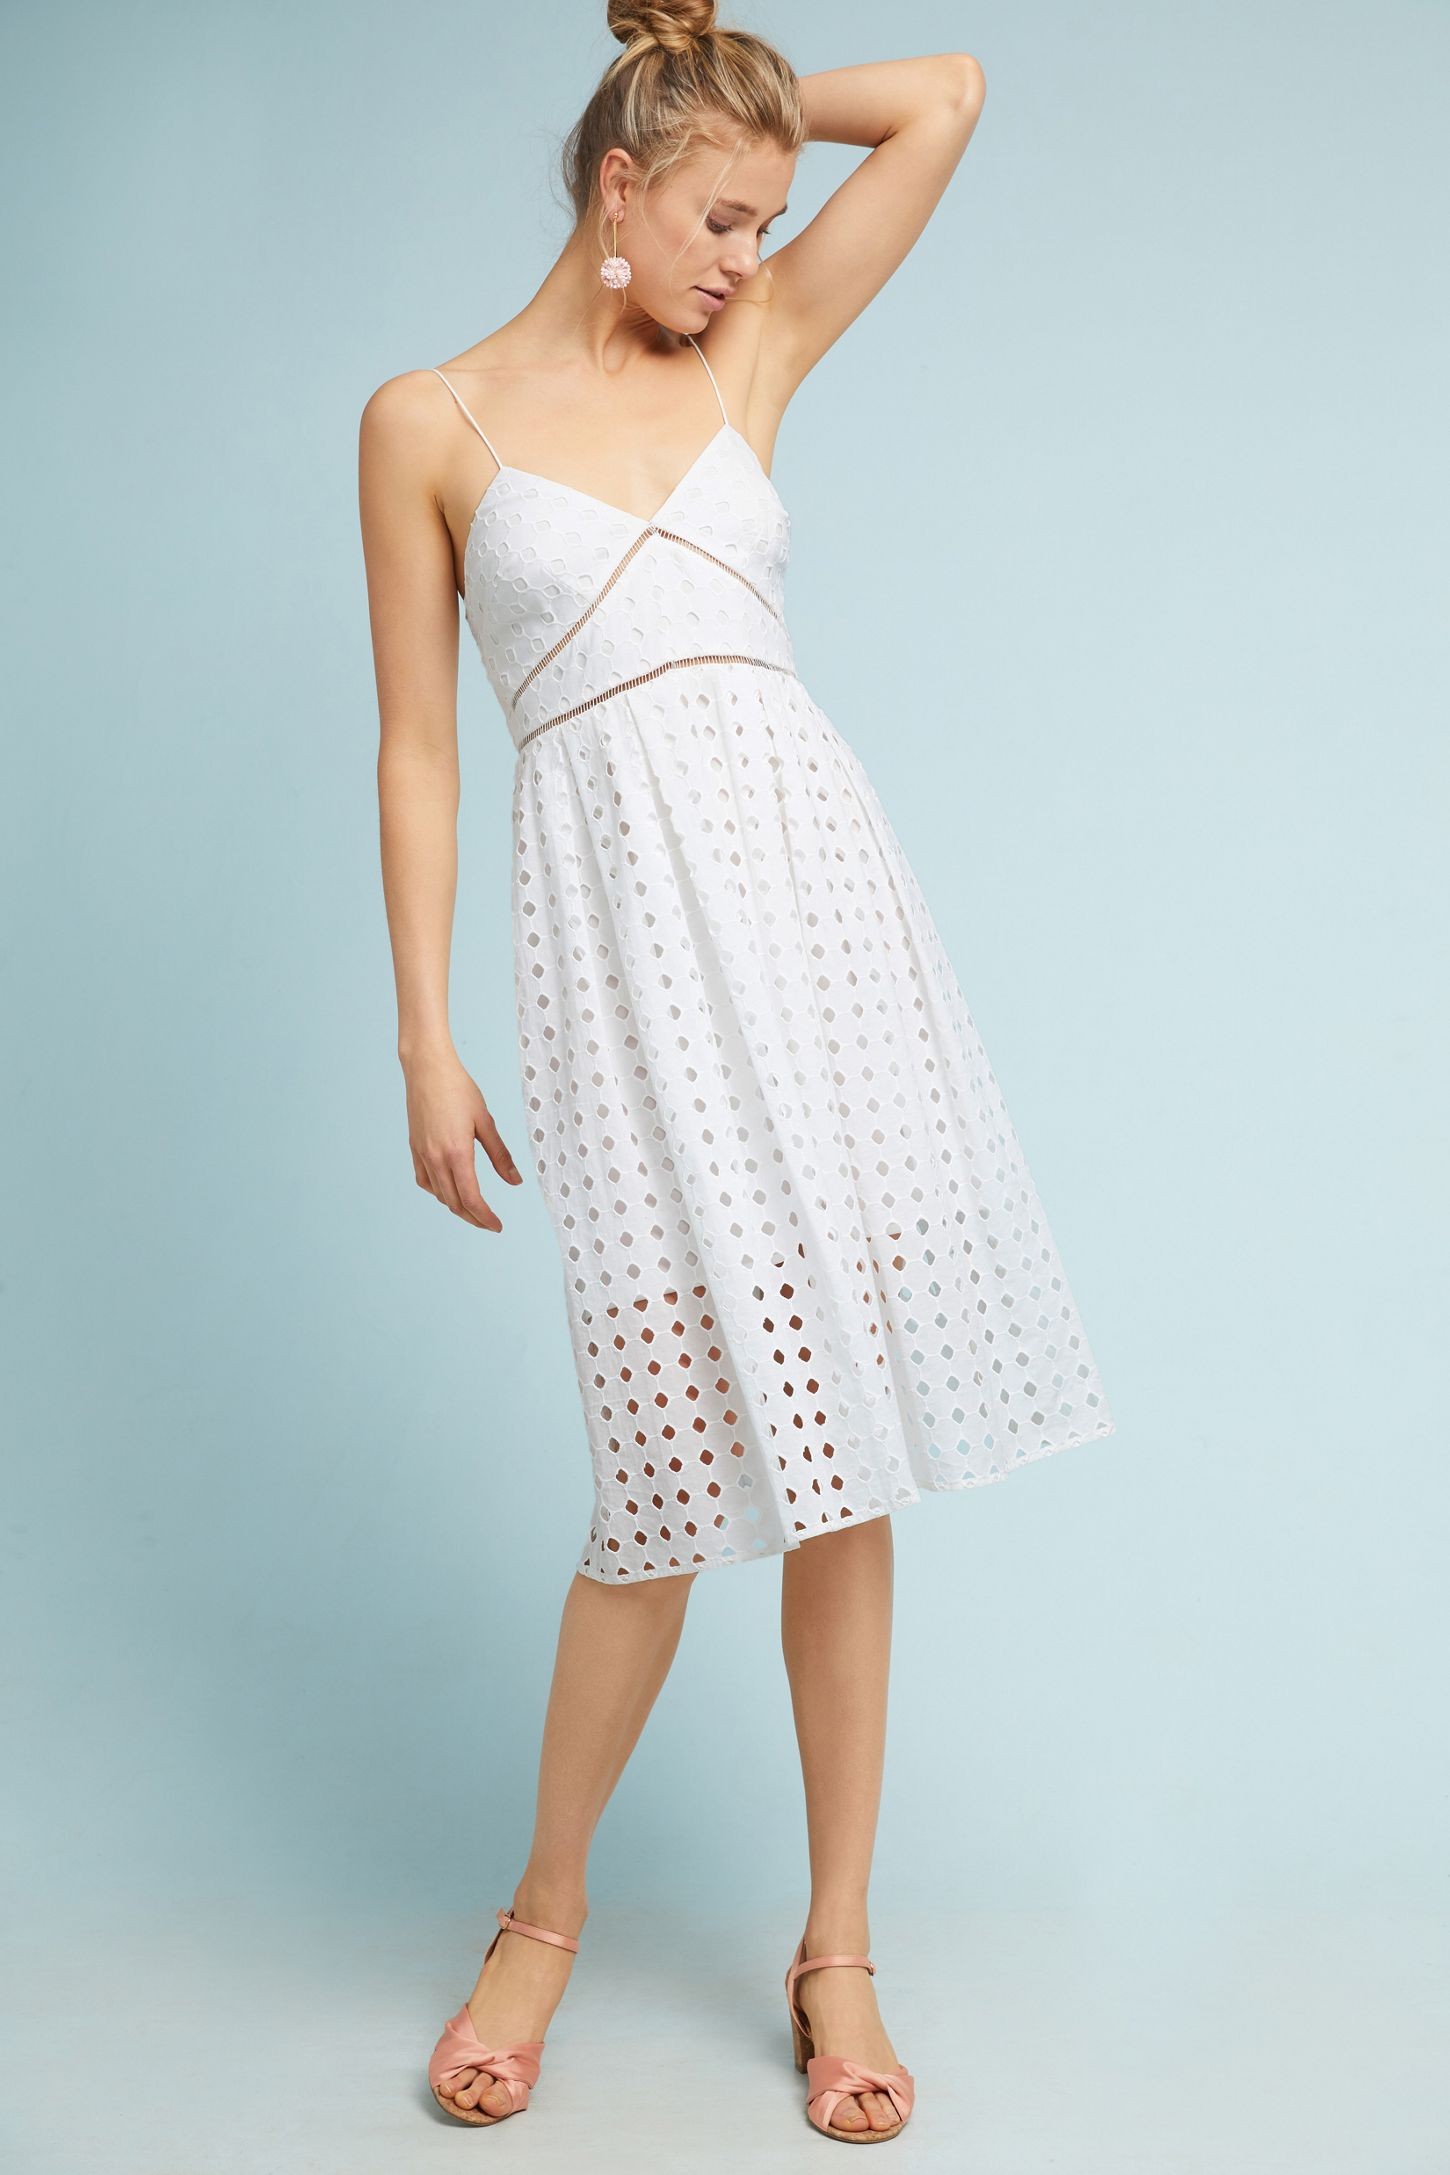 9b1e0bc449c Gridded Lace Petite Dress